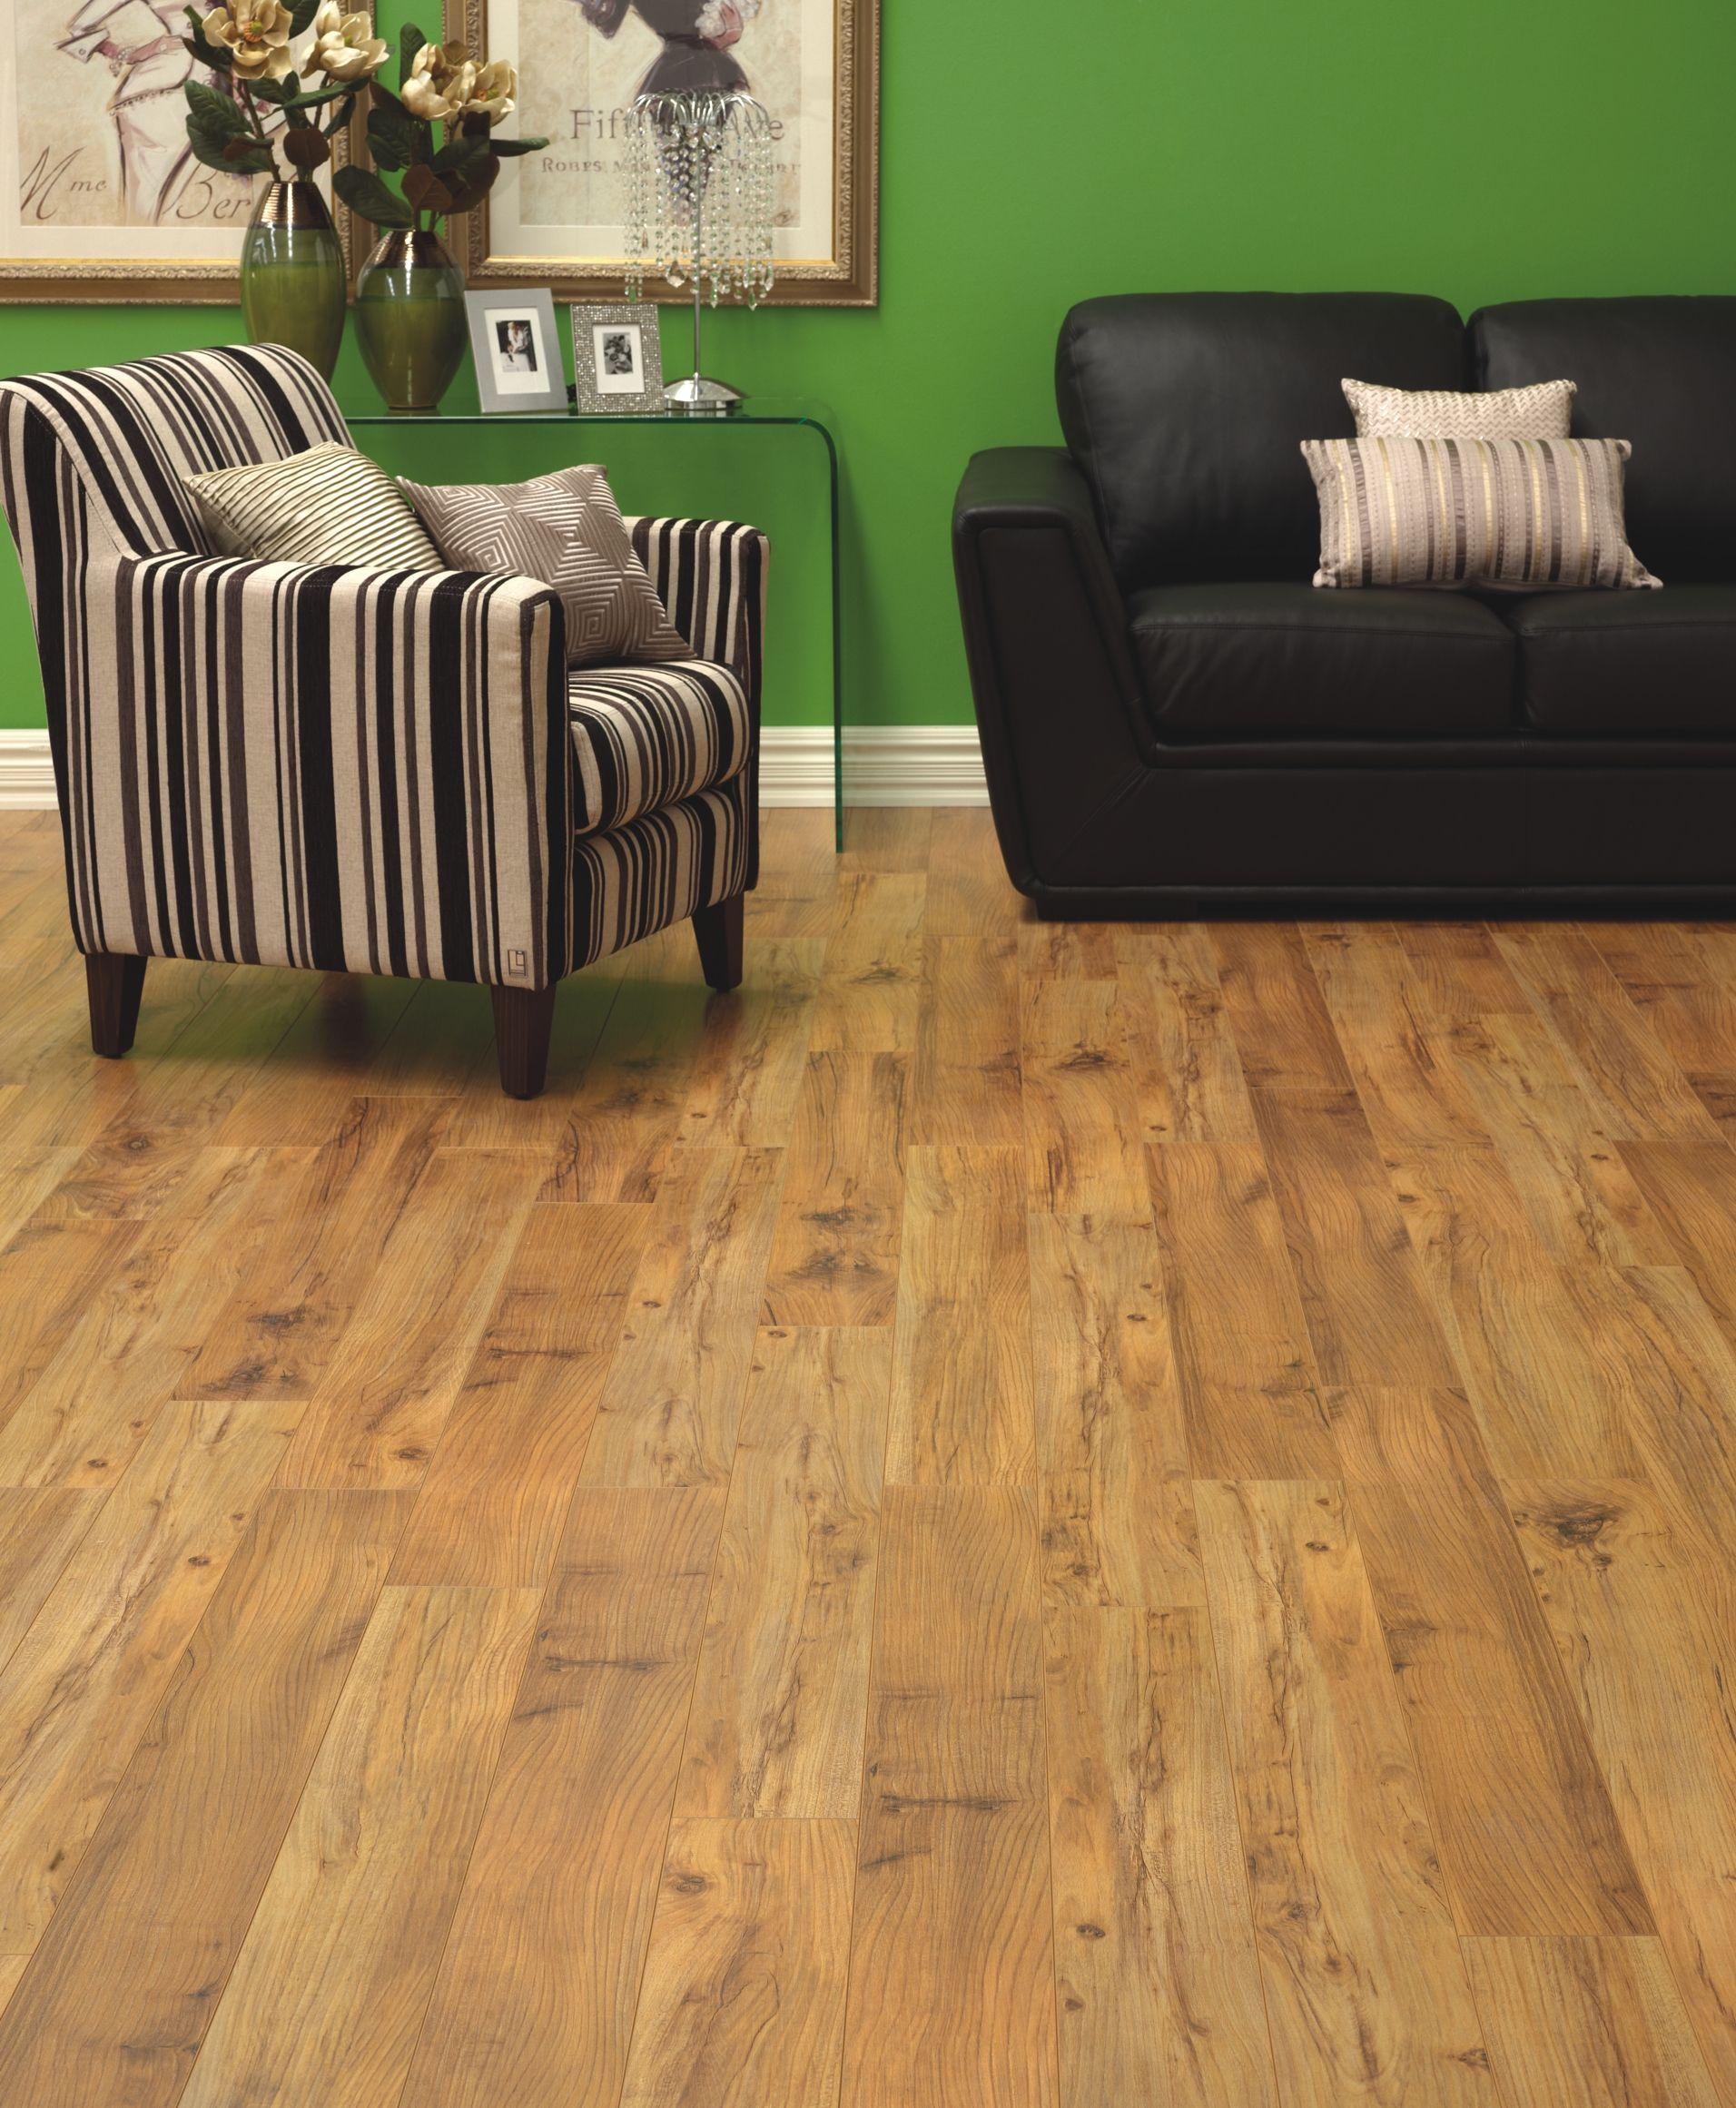 Shaw Laminate Flooring Summerville Pine: Fastlock 'Michigan Pine' Laminate Flooring